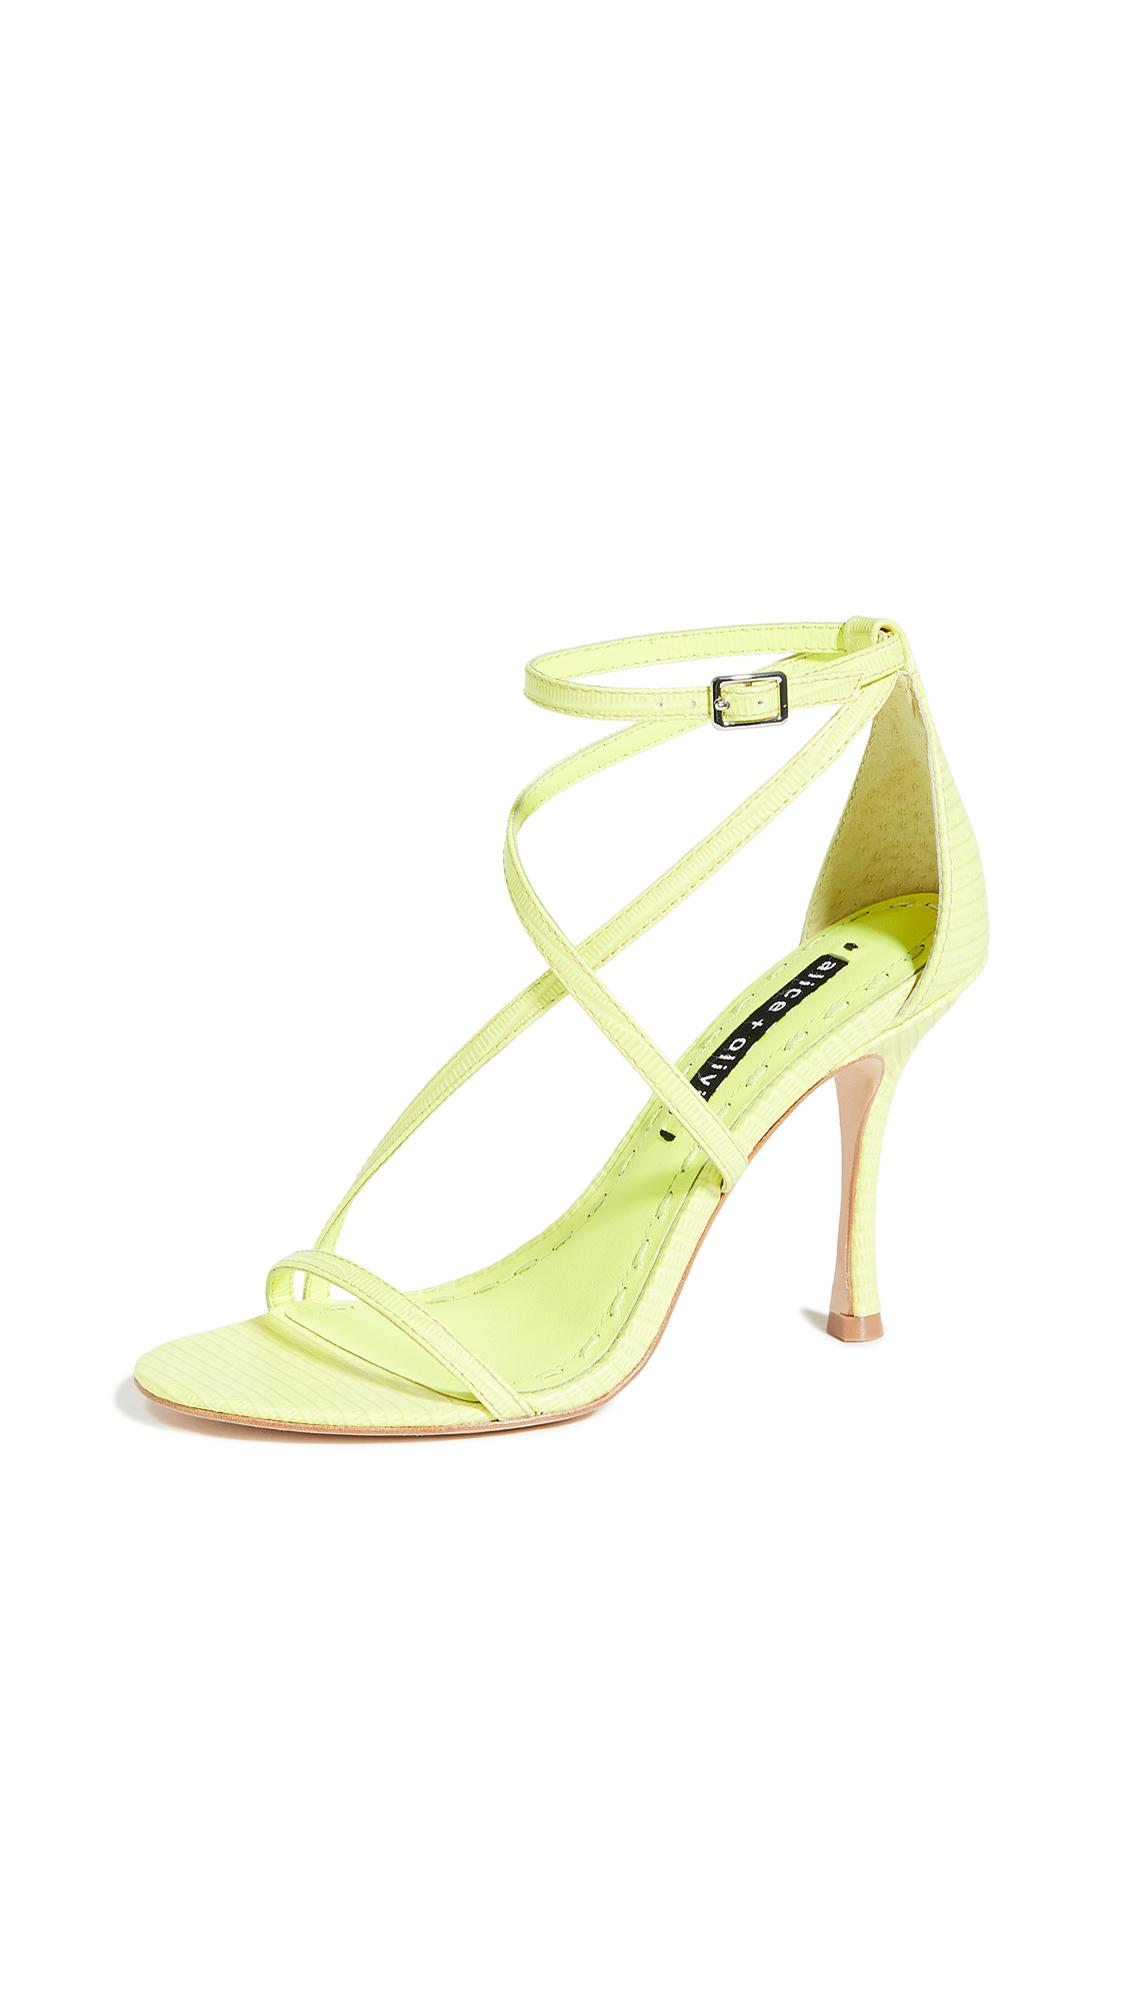 Buy alice + olivia Deidra Sandals online, shop alice + olivia